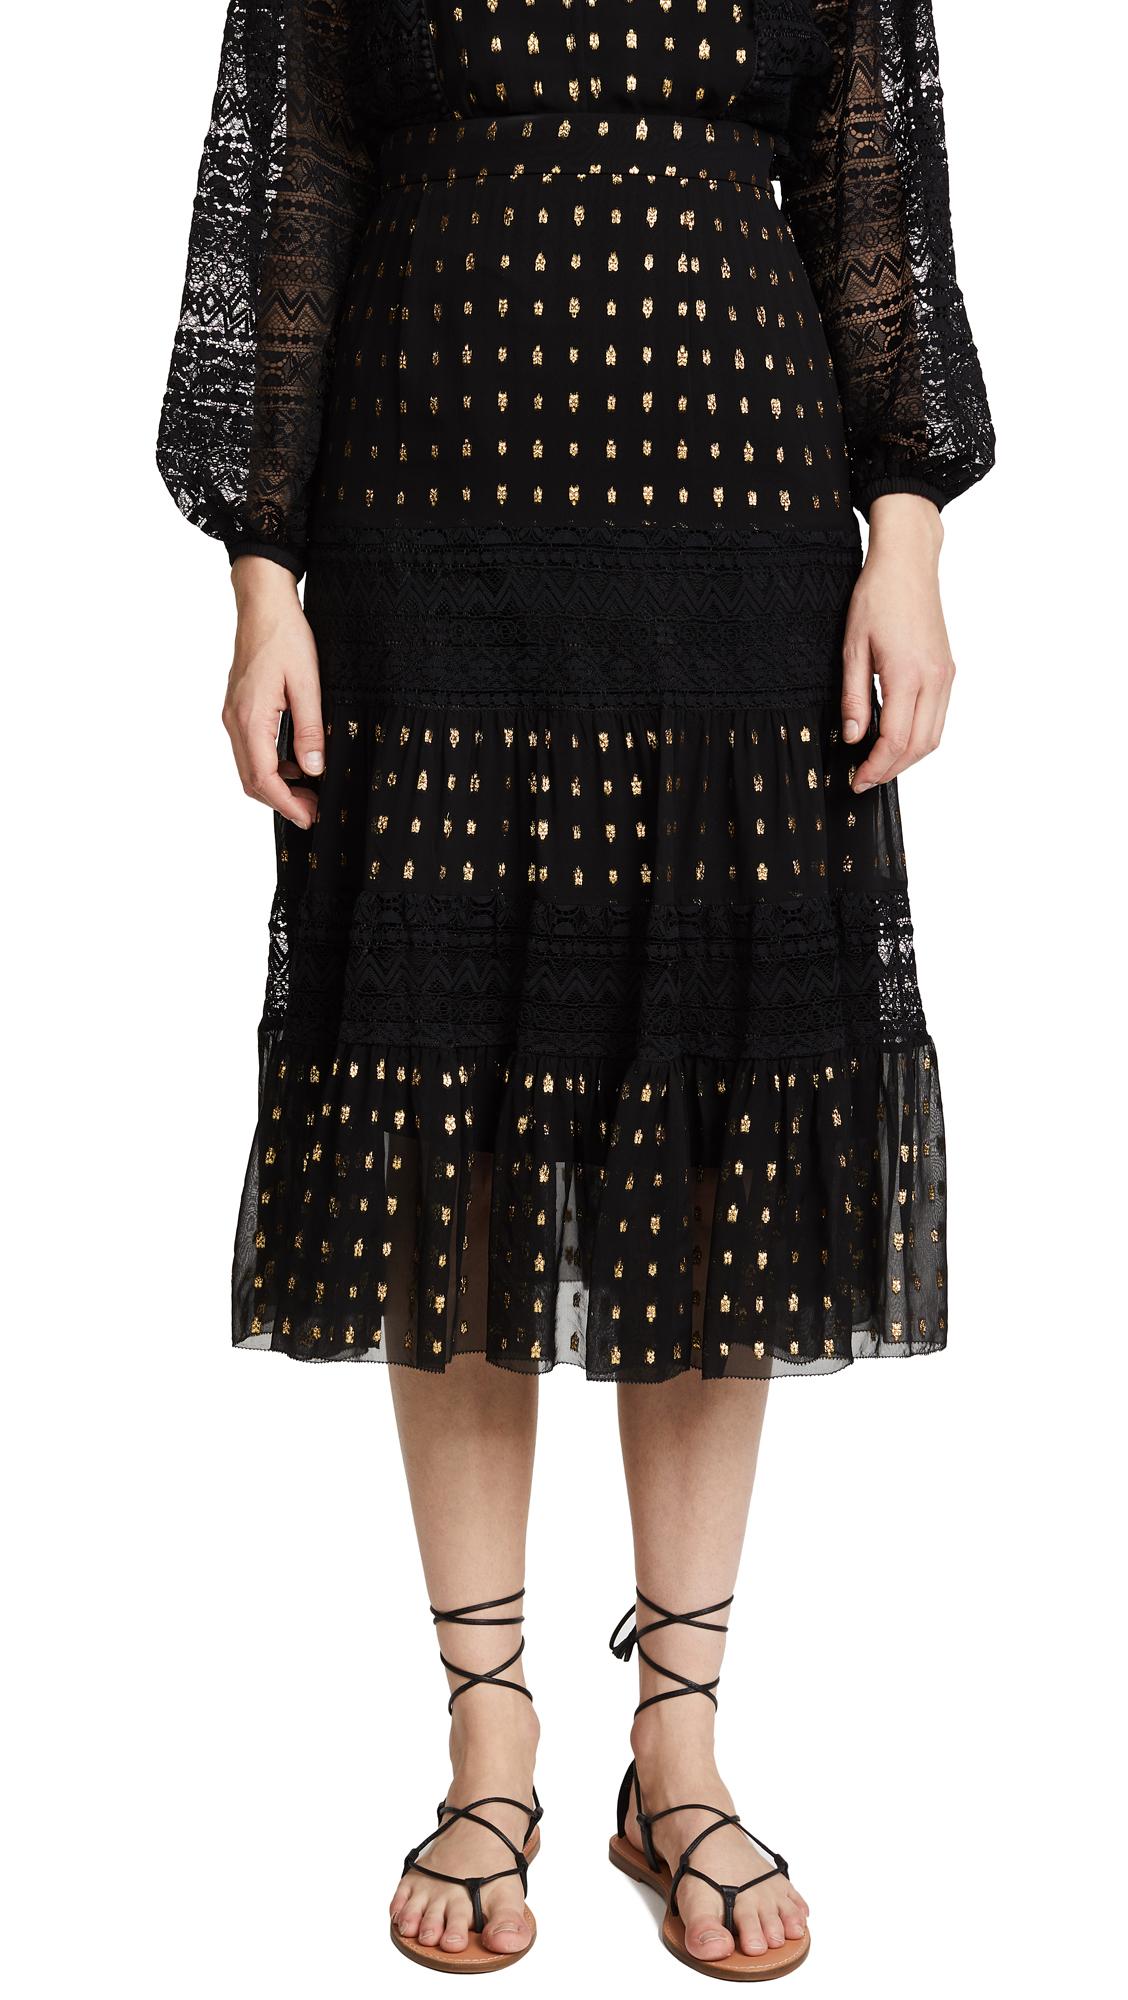 Temperley London Wondering Lace Skirt - Black Mix